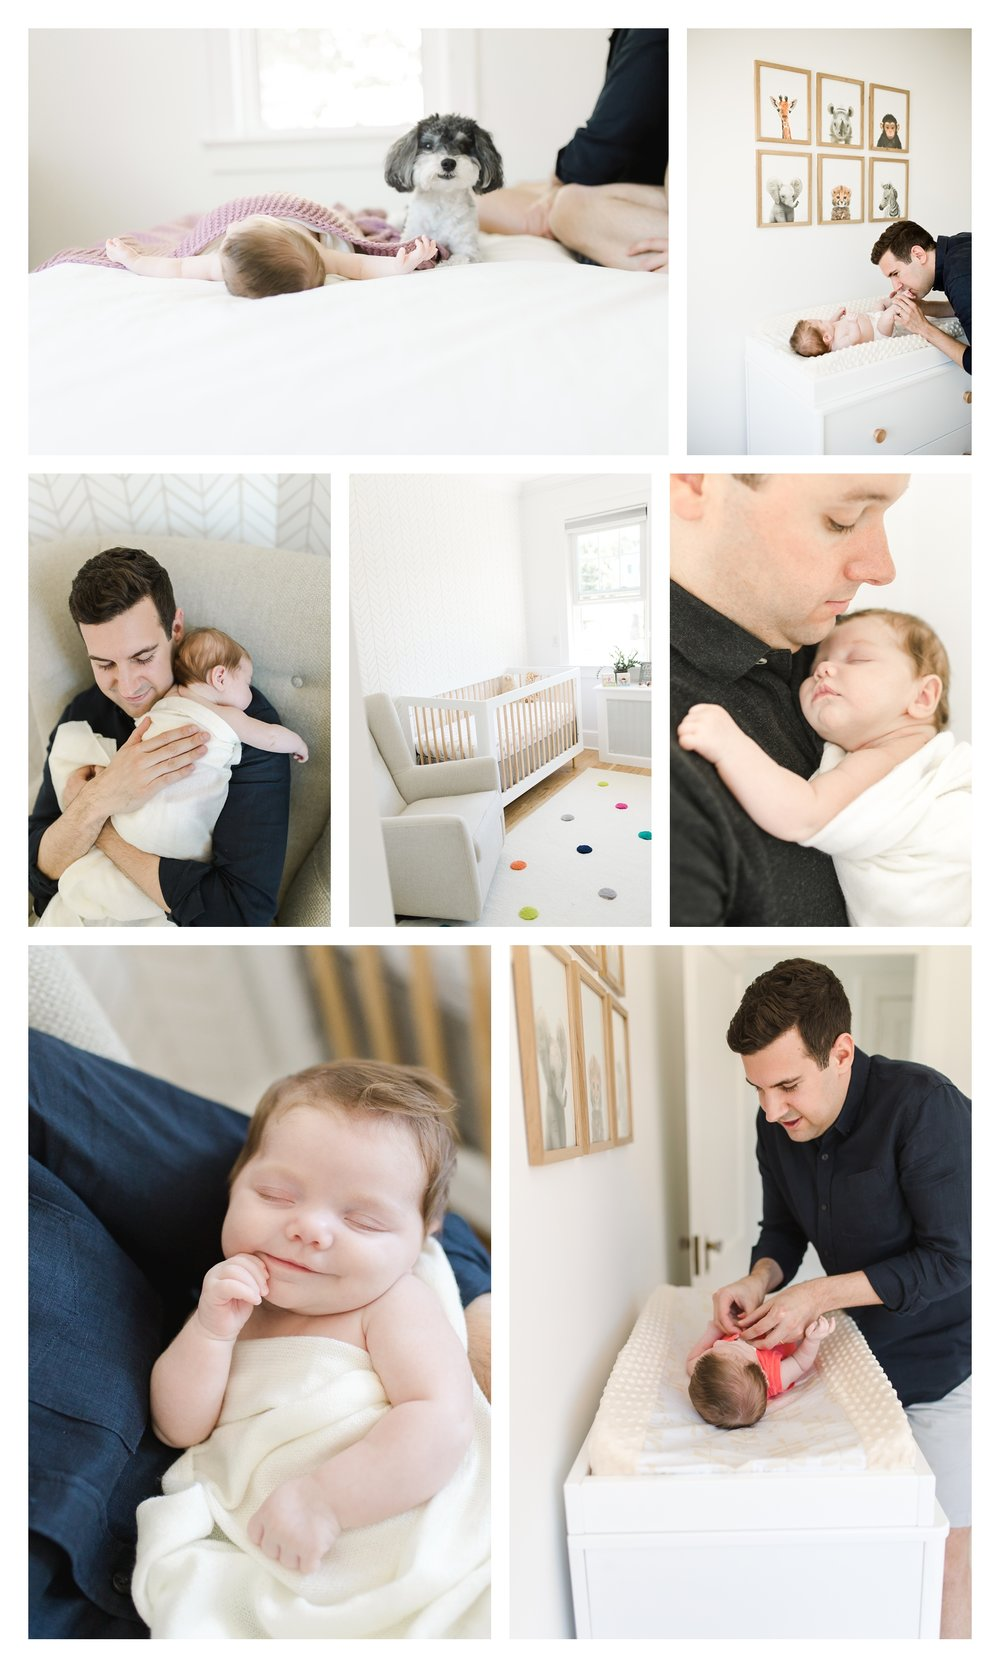 newbornsession-gaycouple-fairfieldcountynewbornphotography-kristinwoodphotography.jpg.jpg